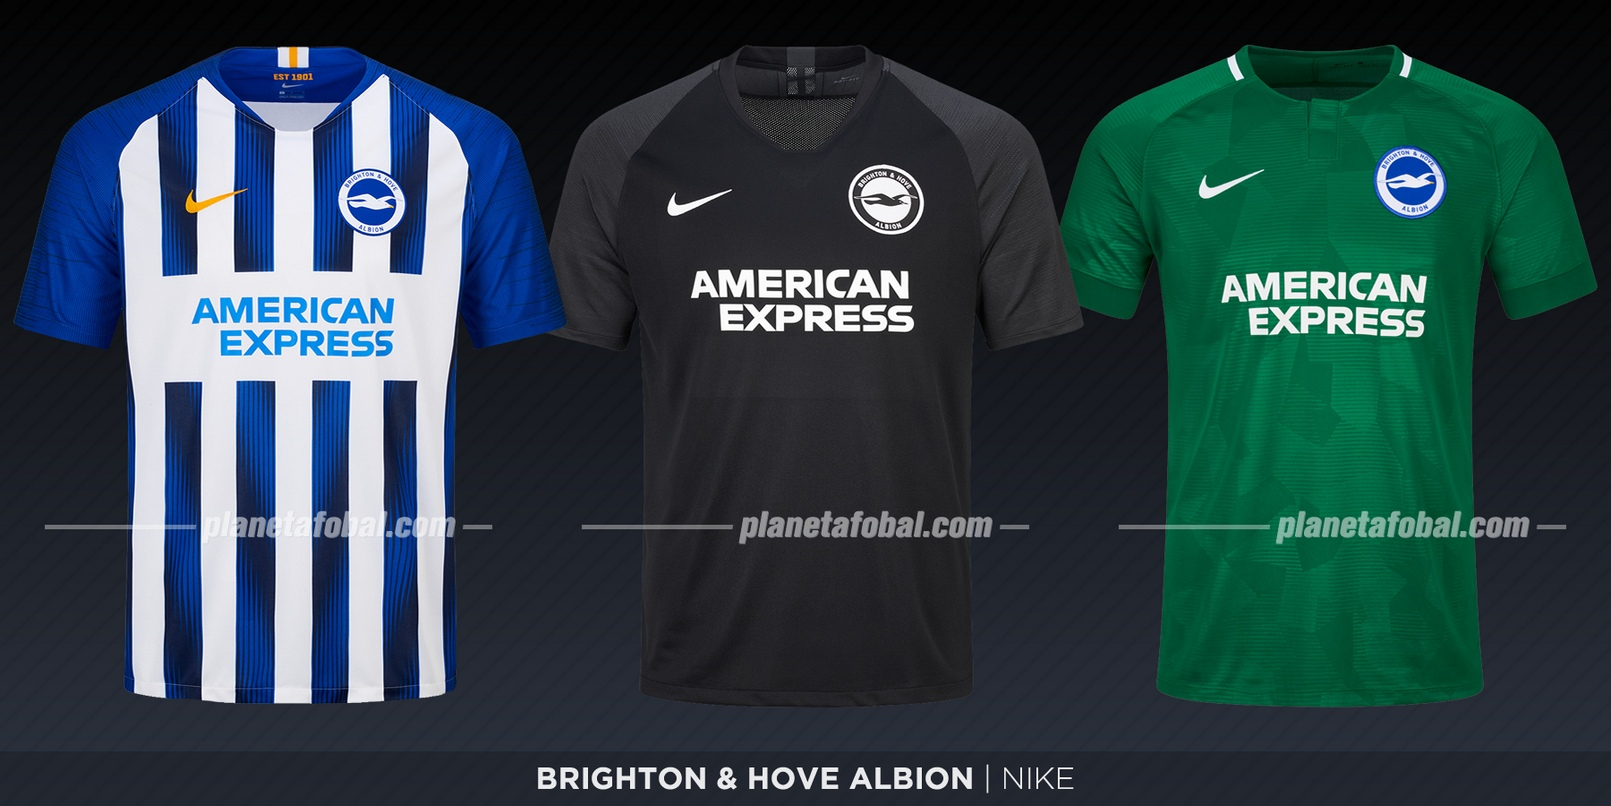 Brighton & Hove Albion (Nike) | Camisetas de la Premier League 2019-2020